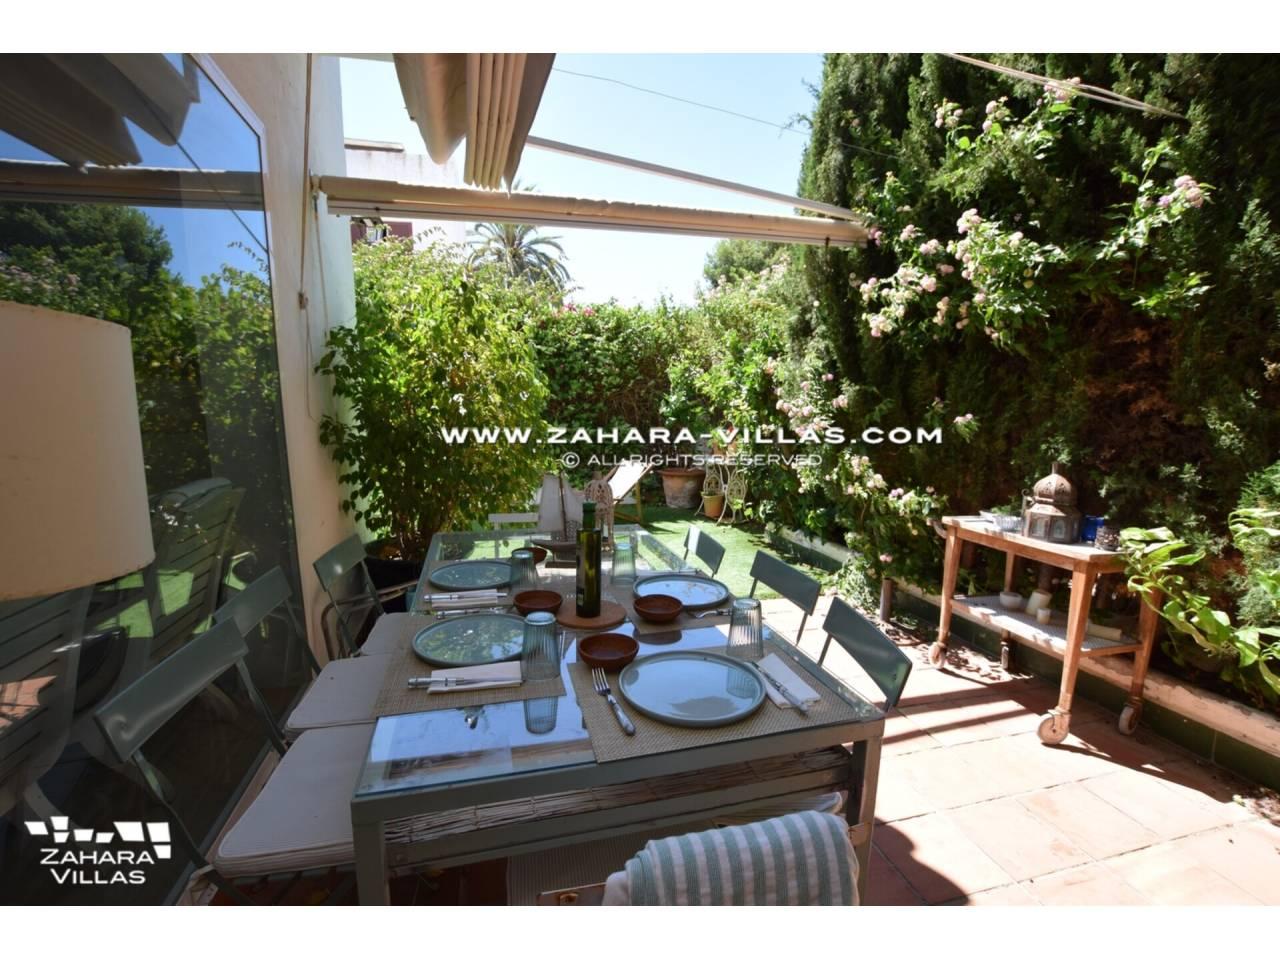 Imagen 19 de House for sale close to the beach, with sea views in Zahara de los Atunes